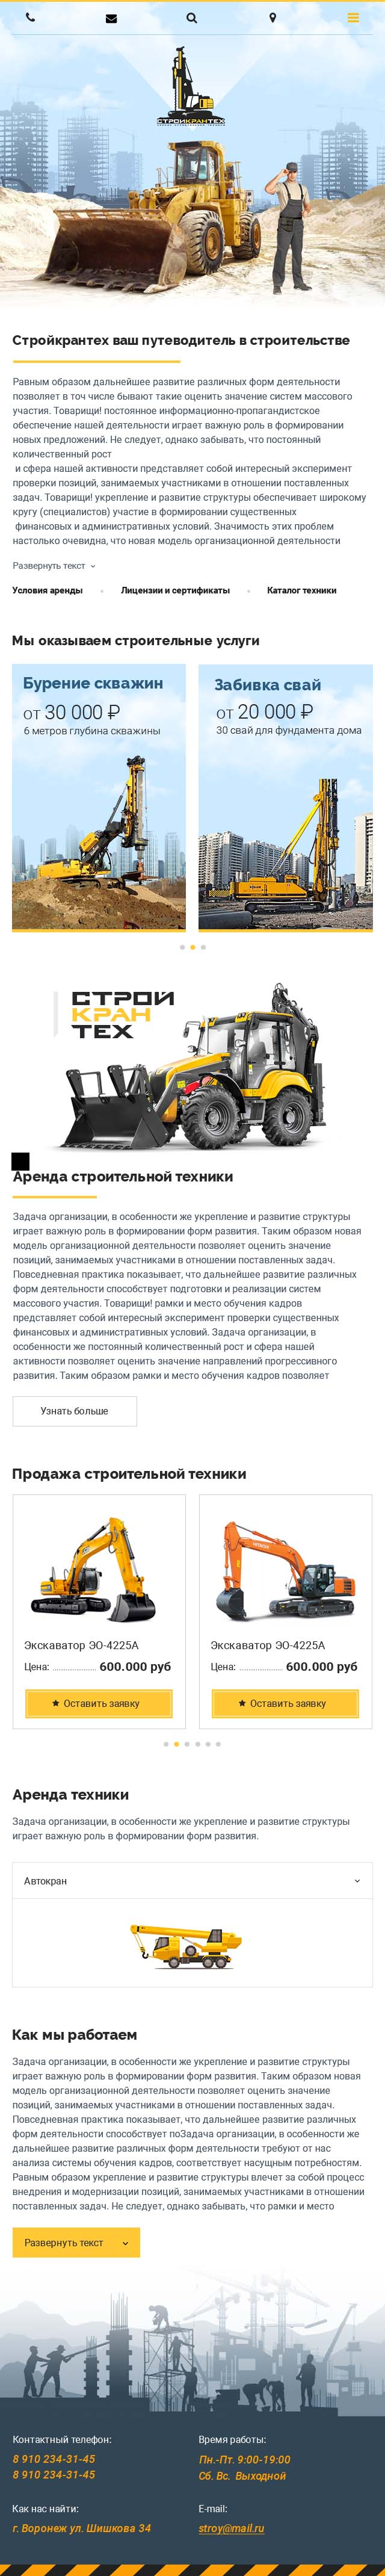 сайты транспорт пример Строй Кран Тех 640 px